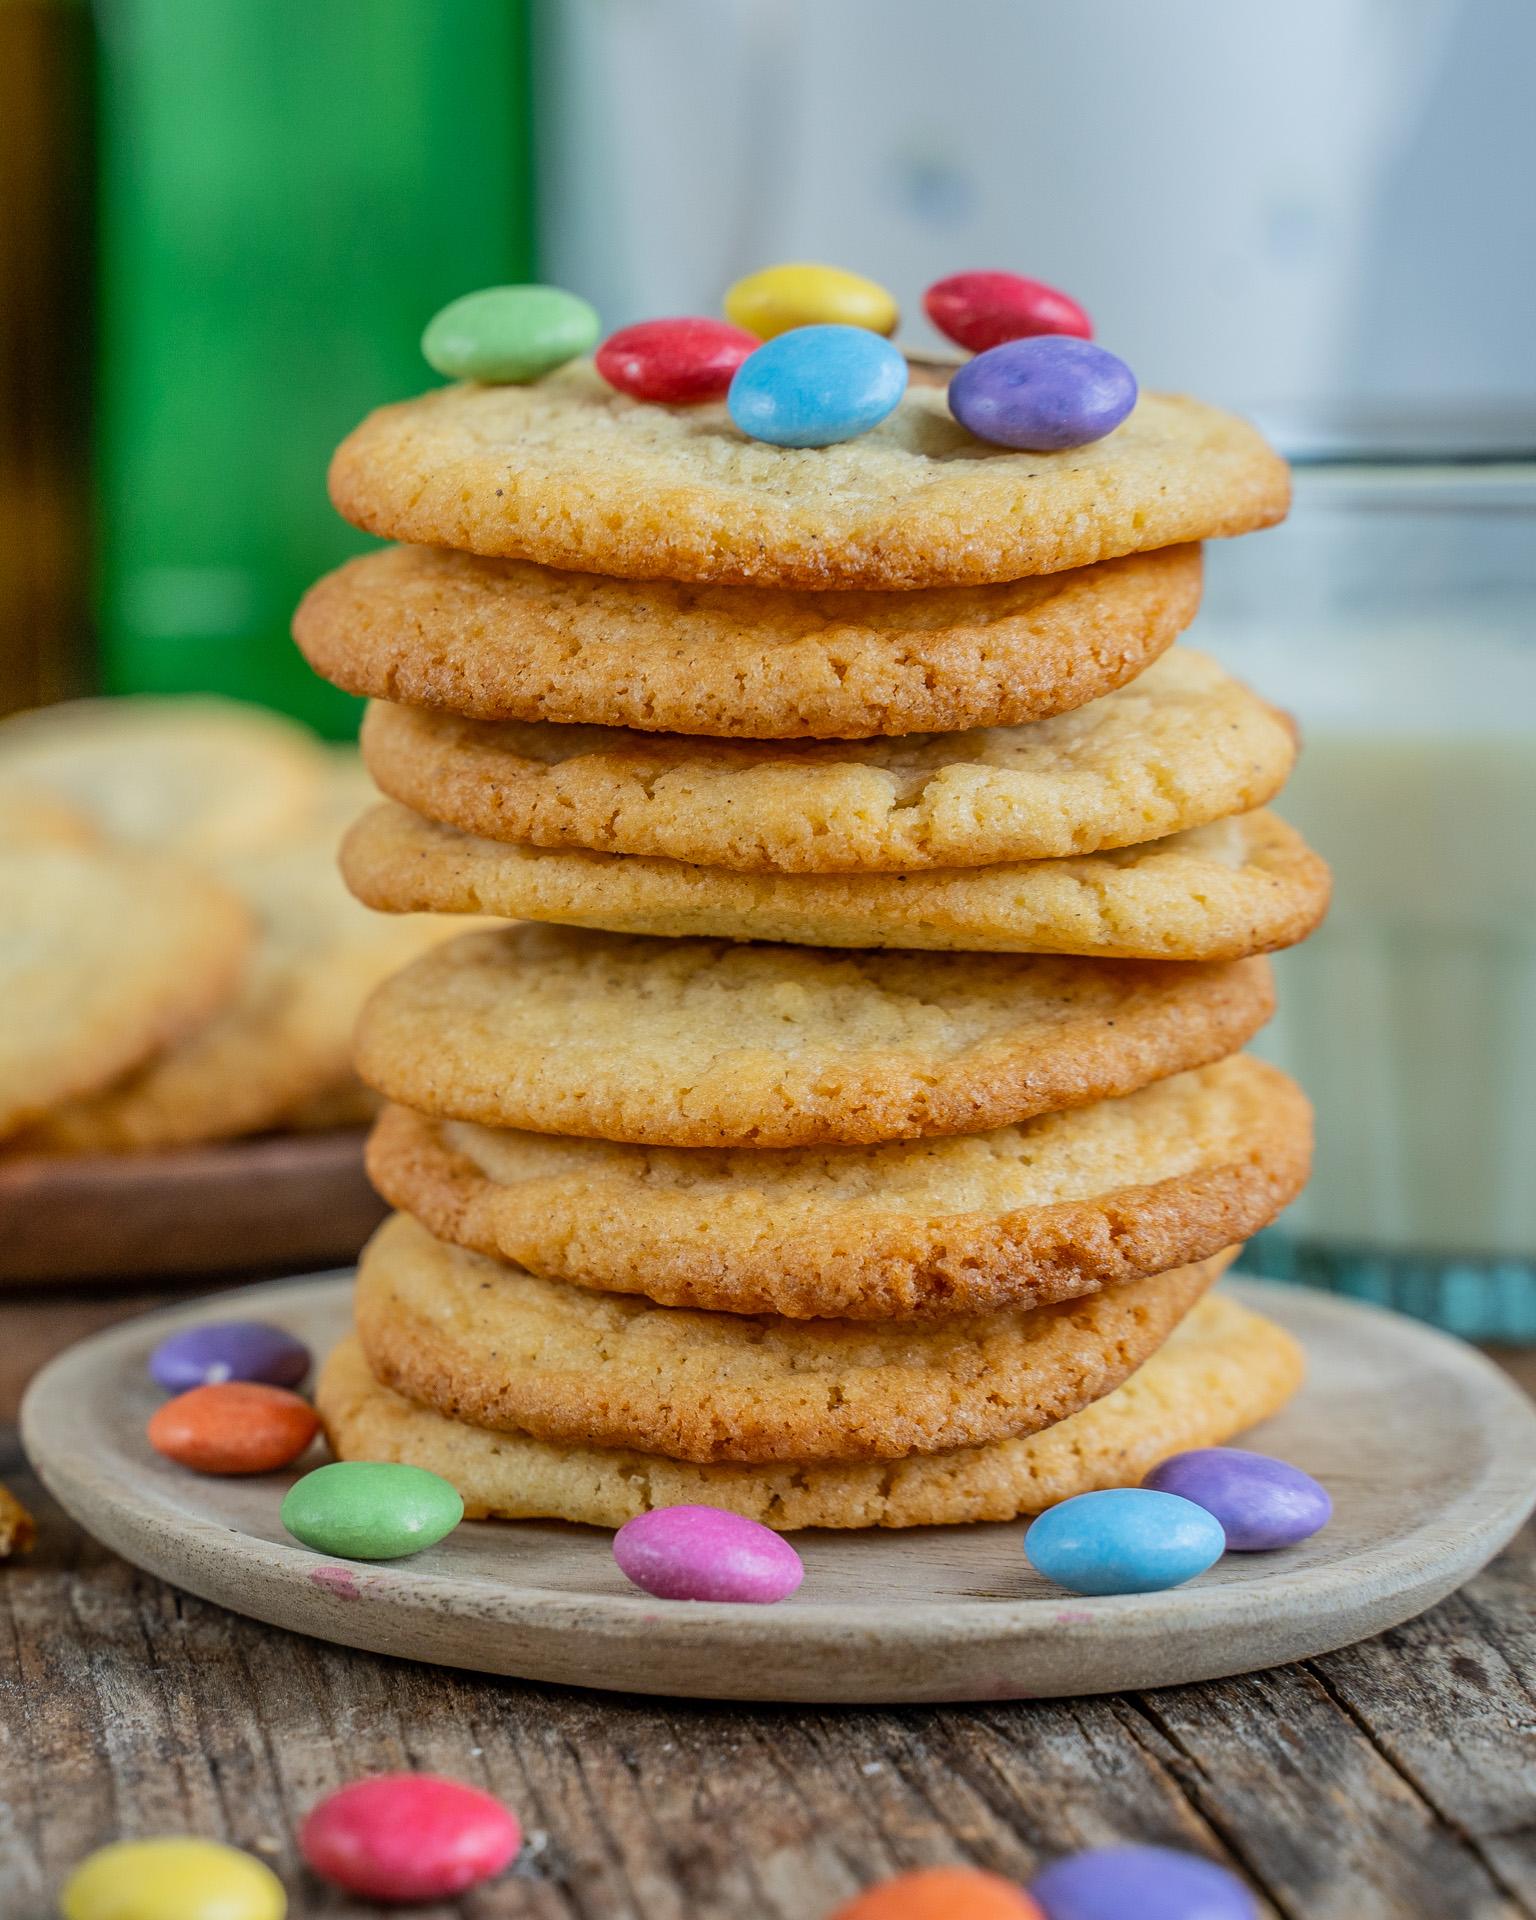 Einfache Cookies Rezept - fertig in 15 Minuten Mrs Flury